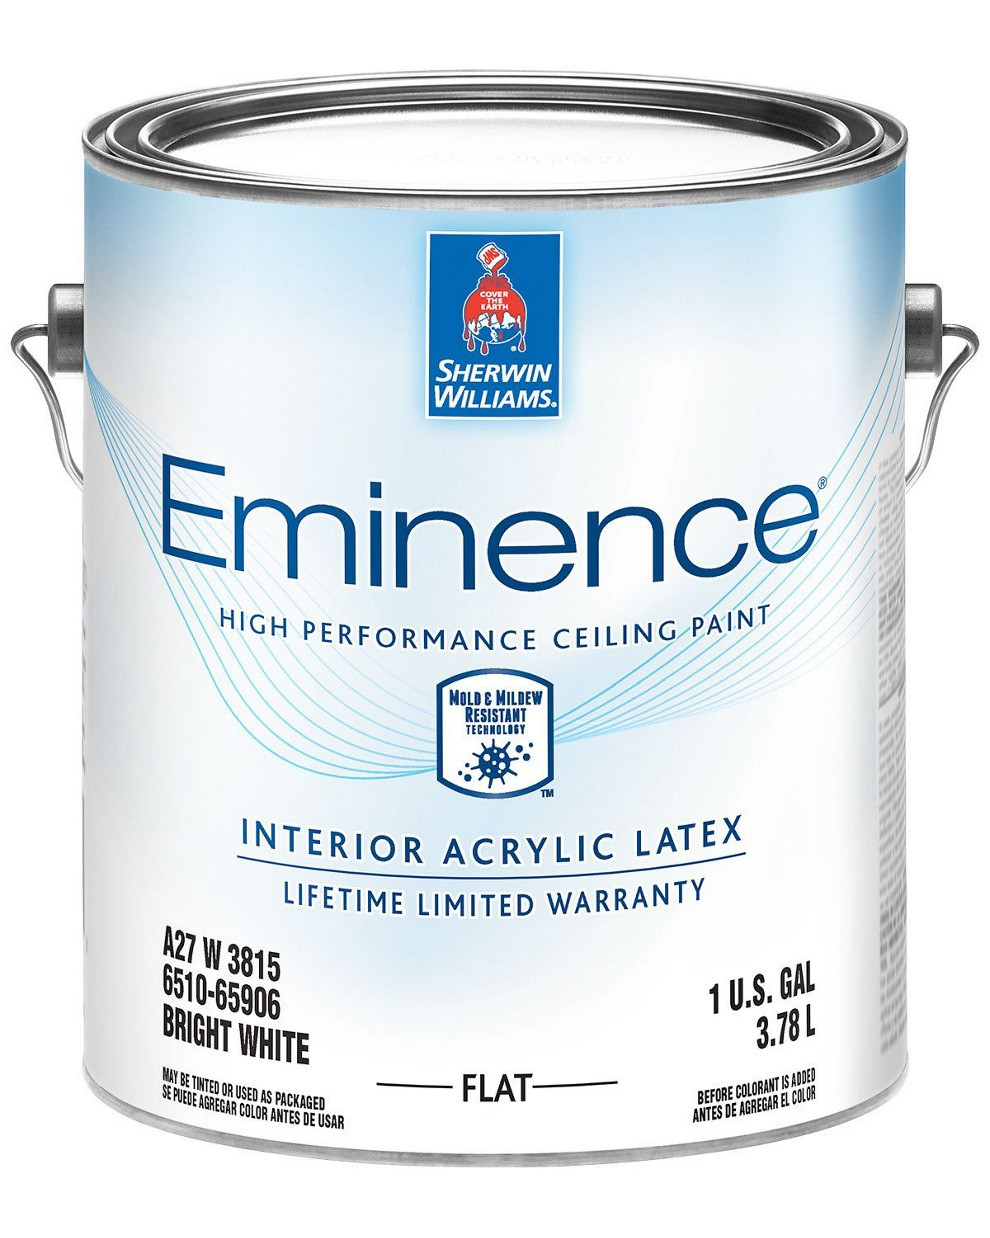 Краска Eminence Flat Sherwin-Williams ярко белая интерьерная глубокоматовая, 3,78л (эминенс для потолка)